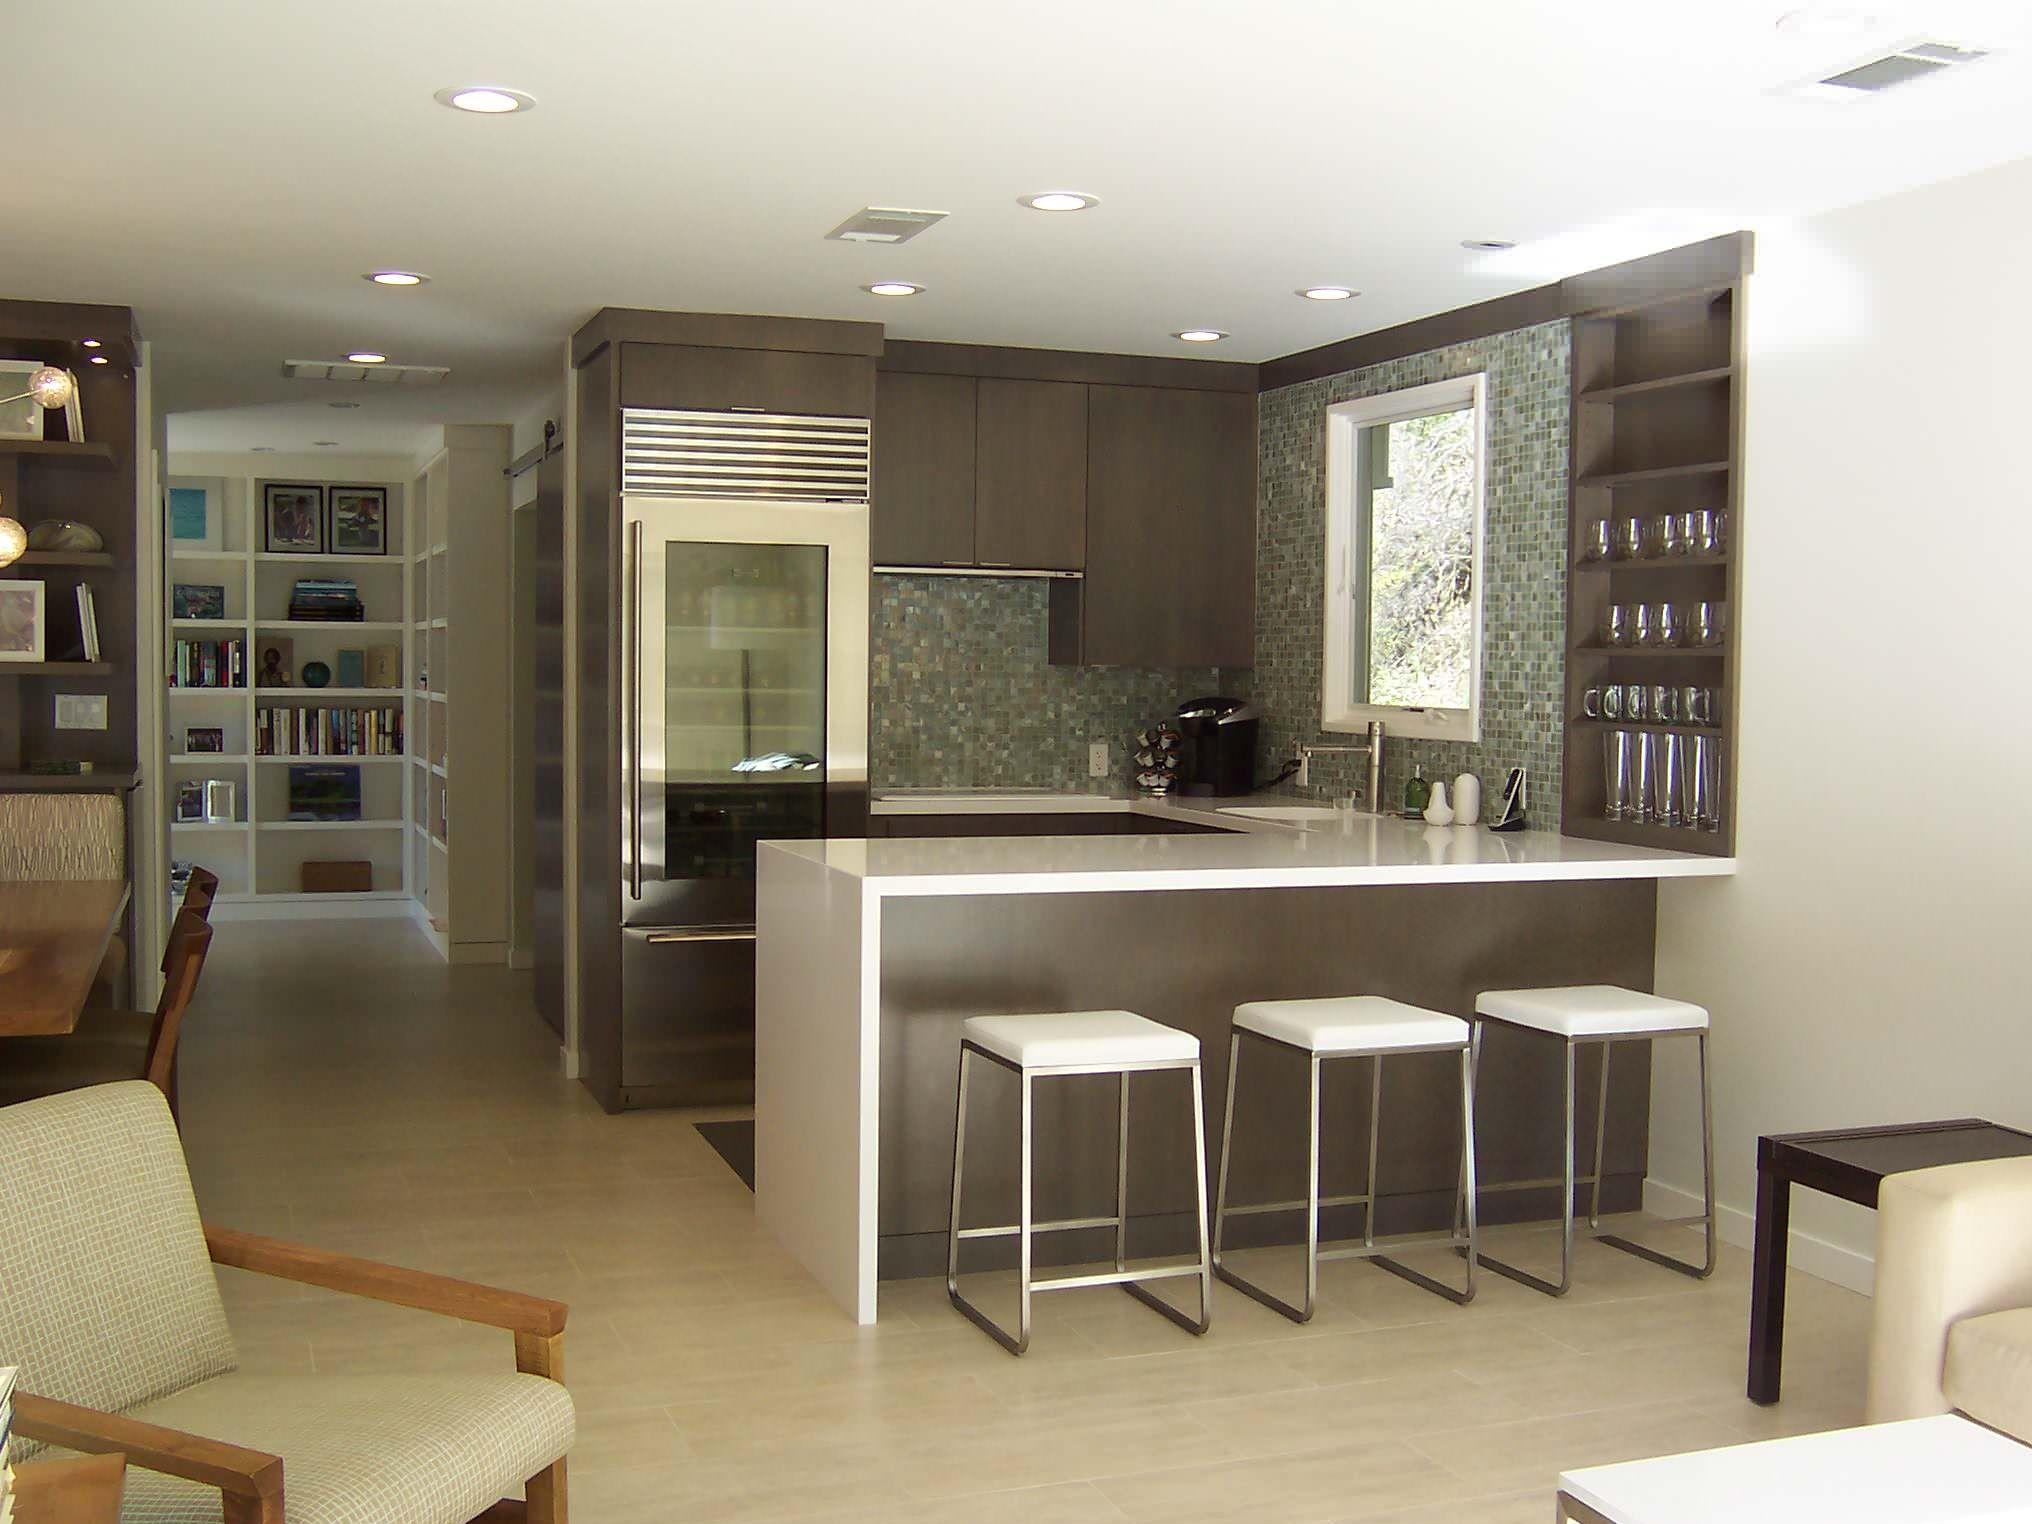 pin en kitchen ideas on kitchen decor themes modern id=42544